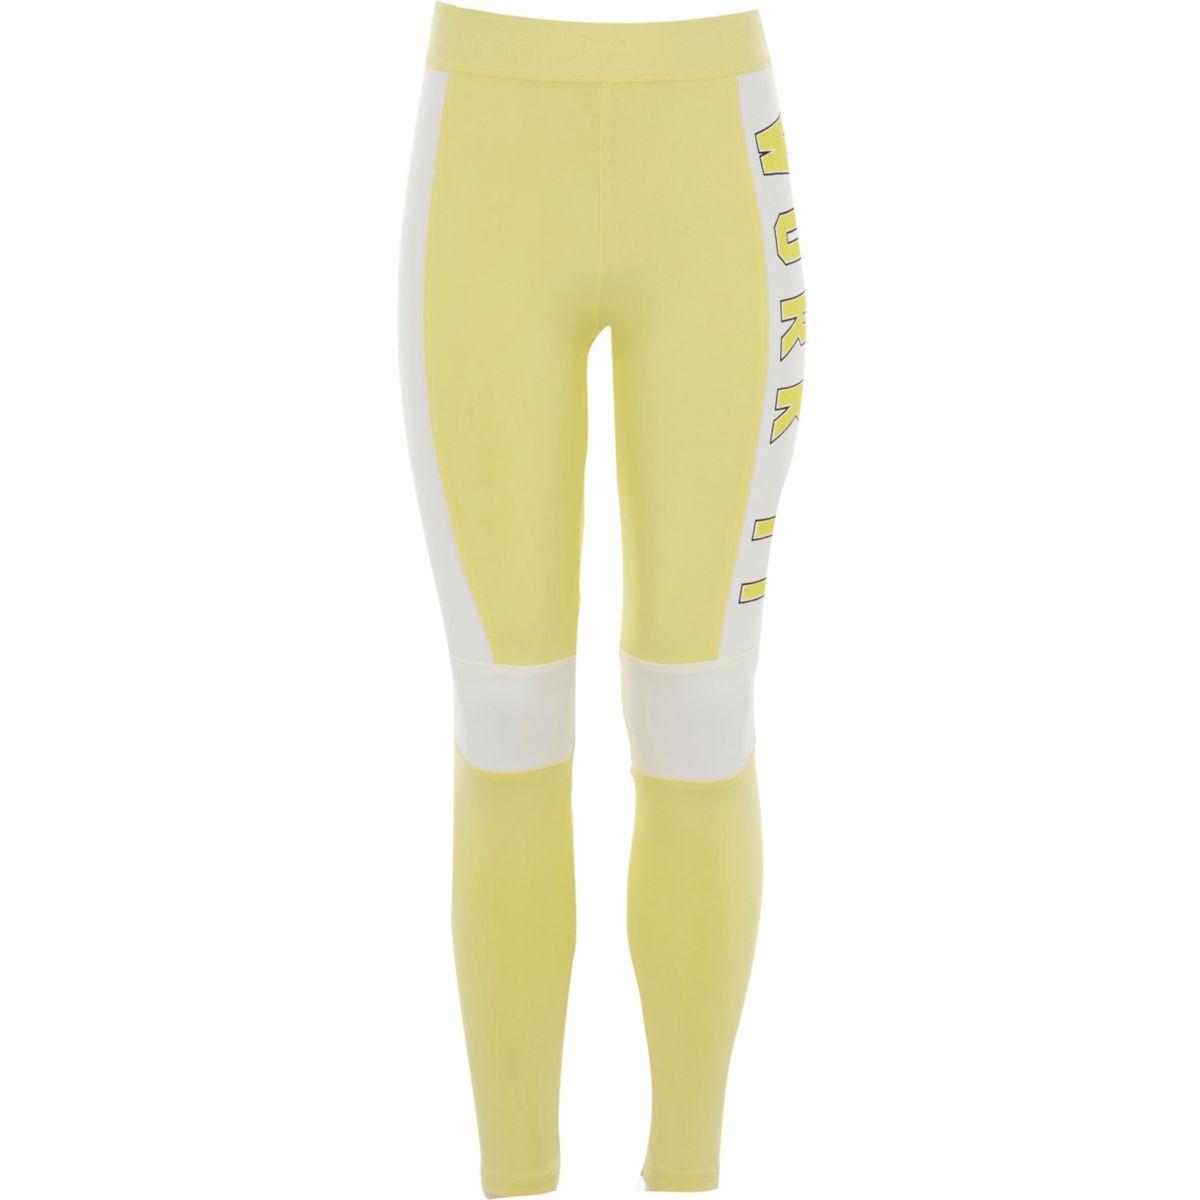 Legging jaune «work it» colour block pour fille